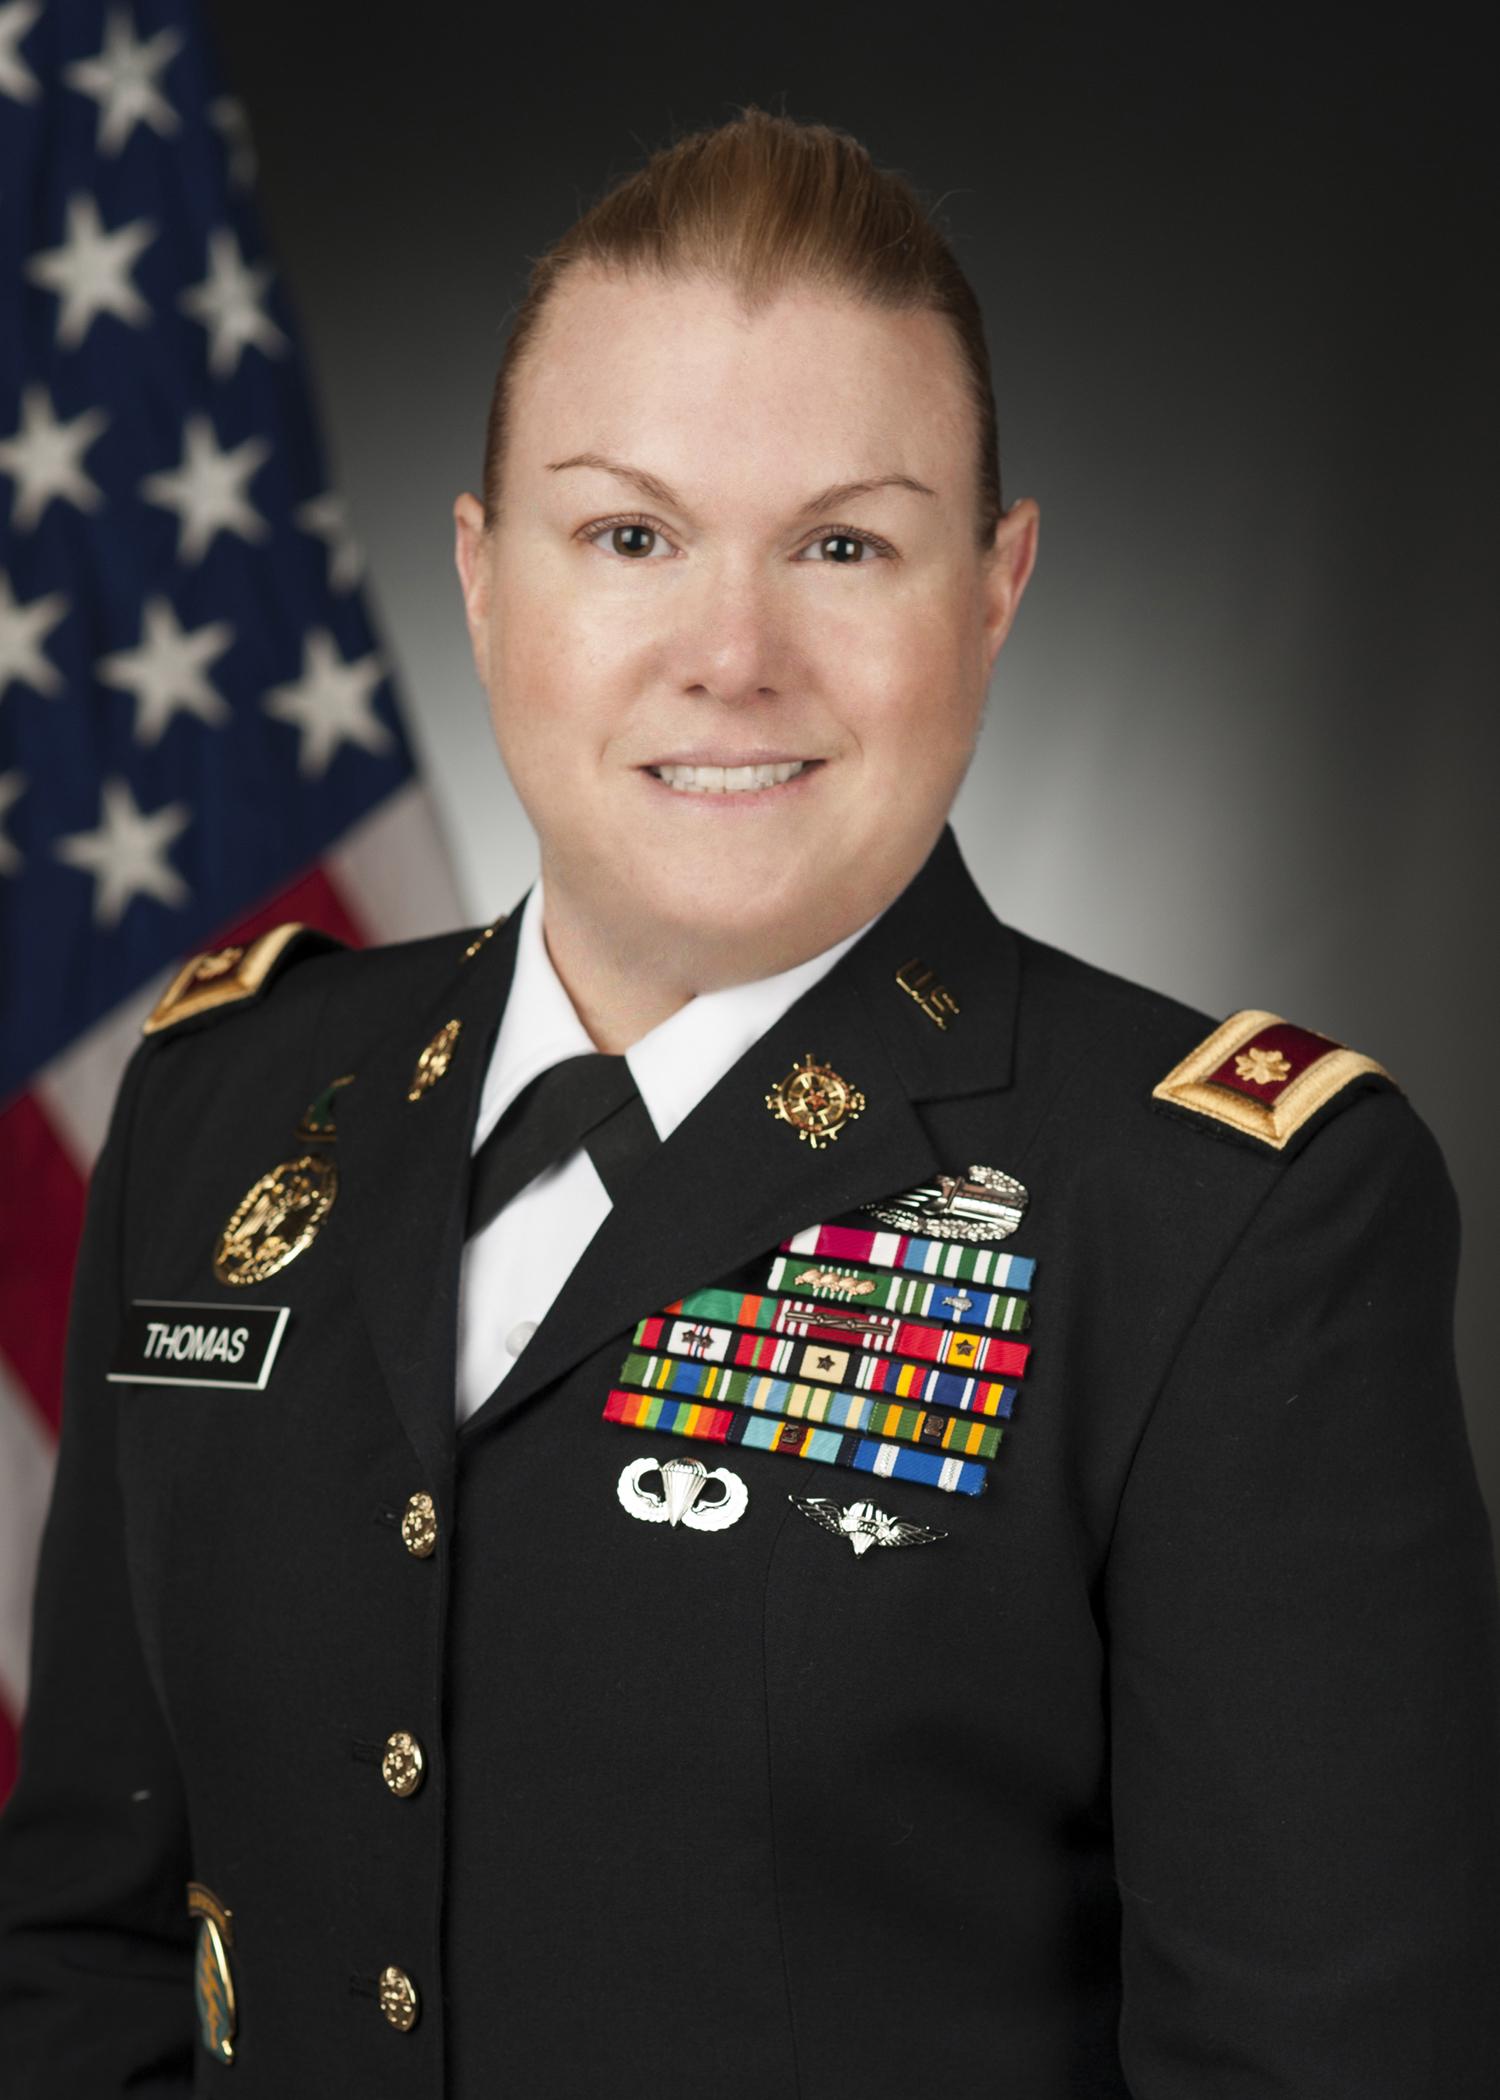 Tom kennedy us army claims service - Carla Thomas